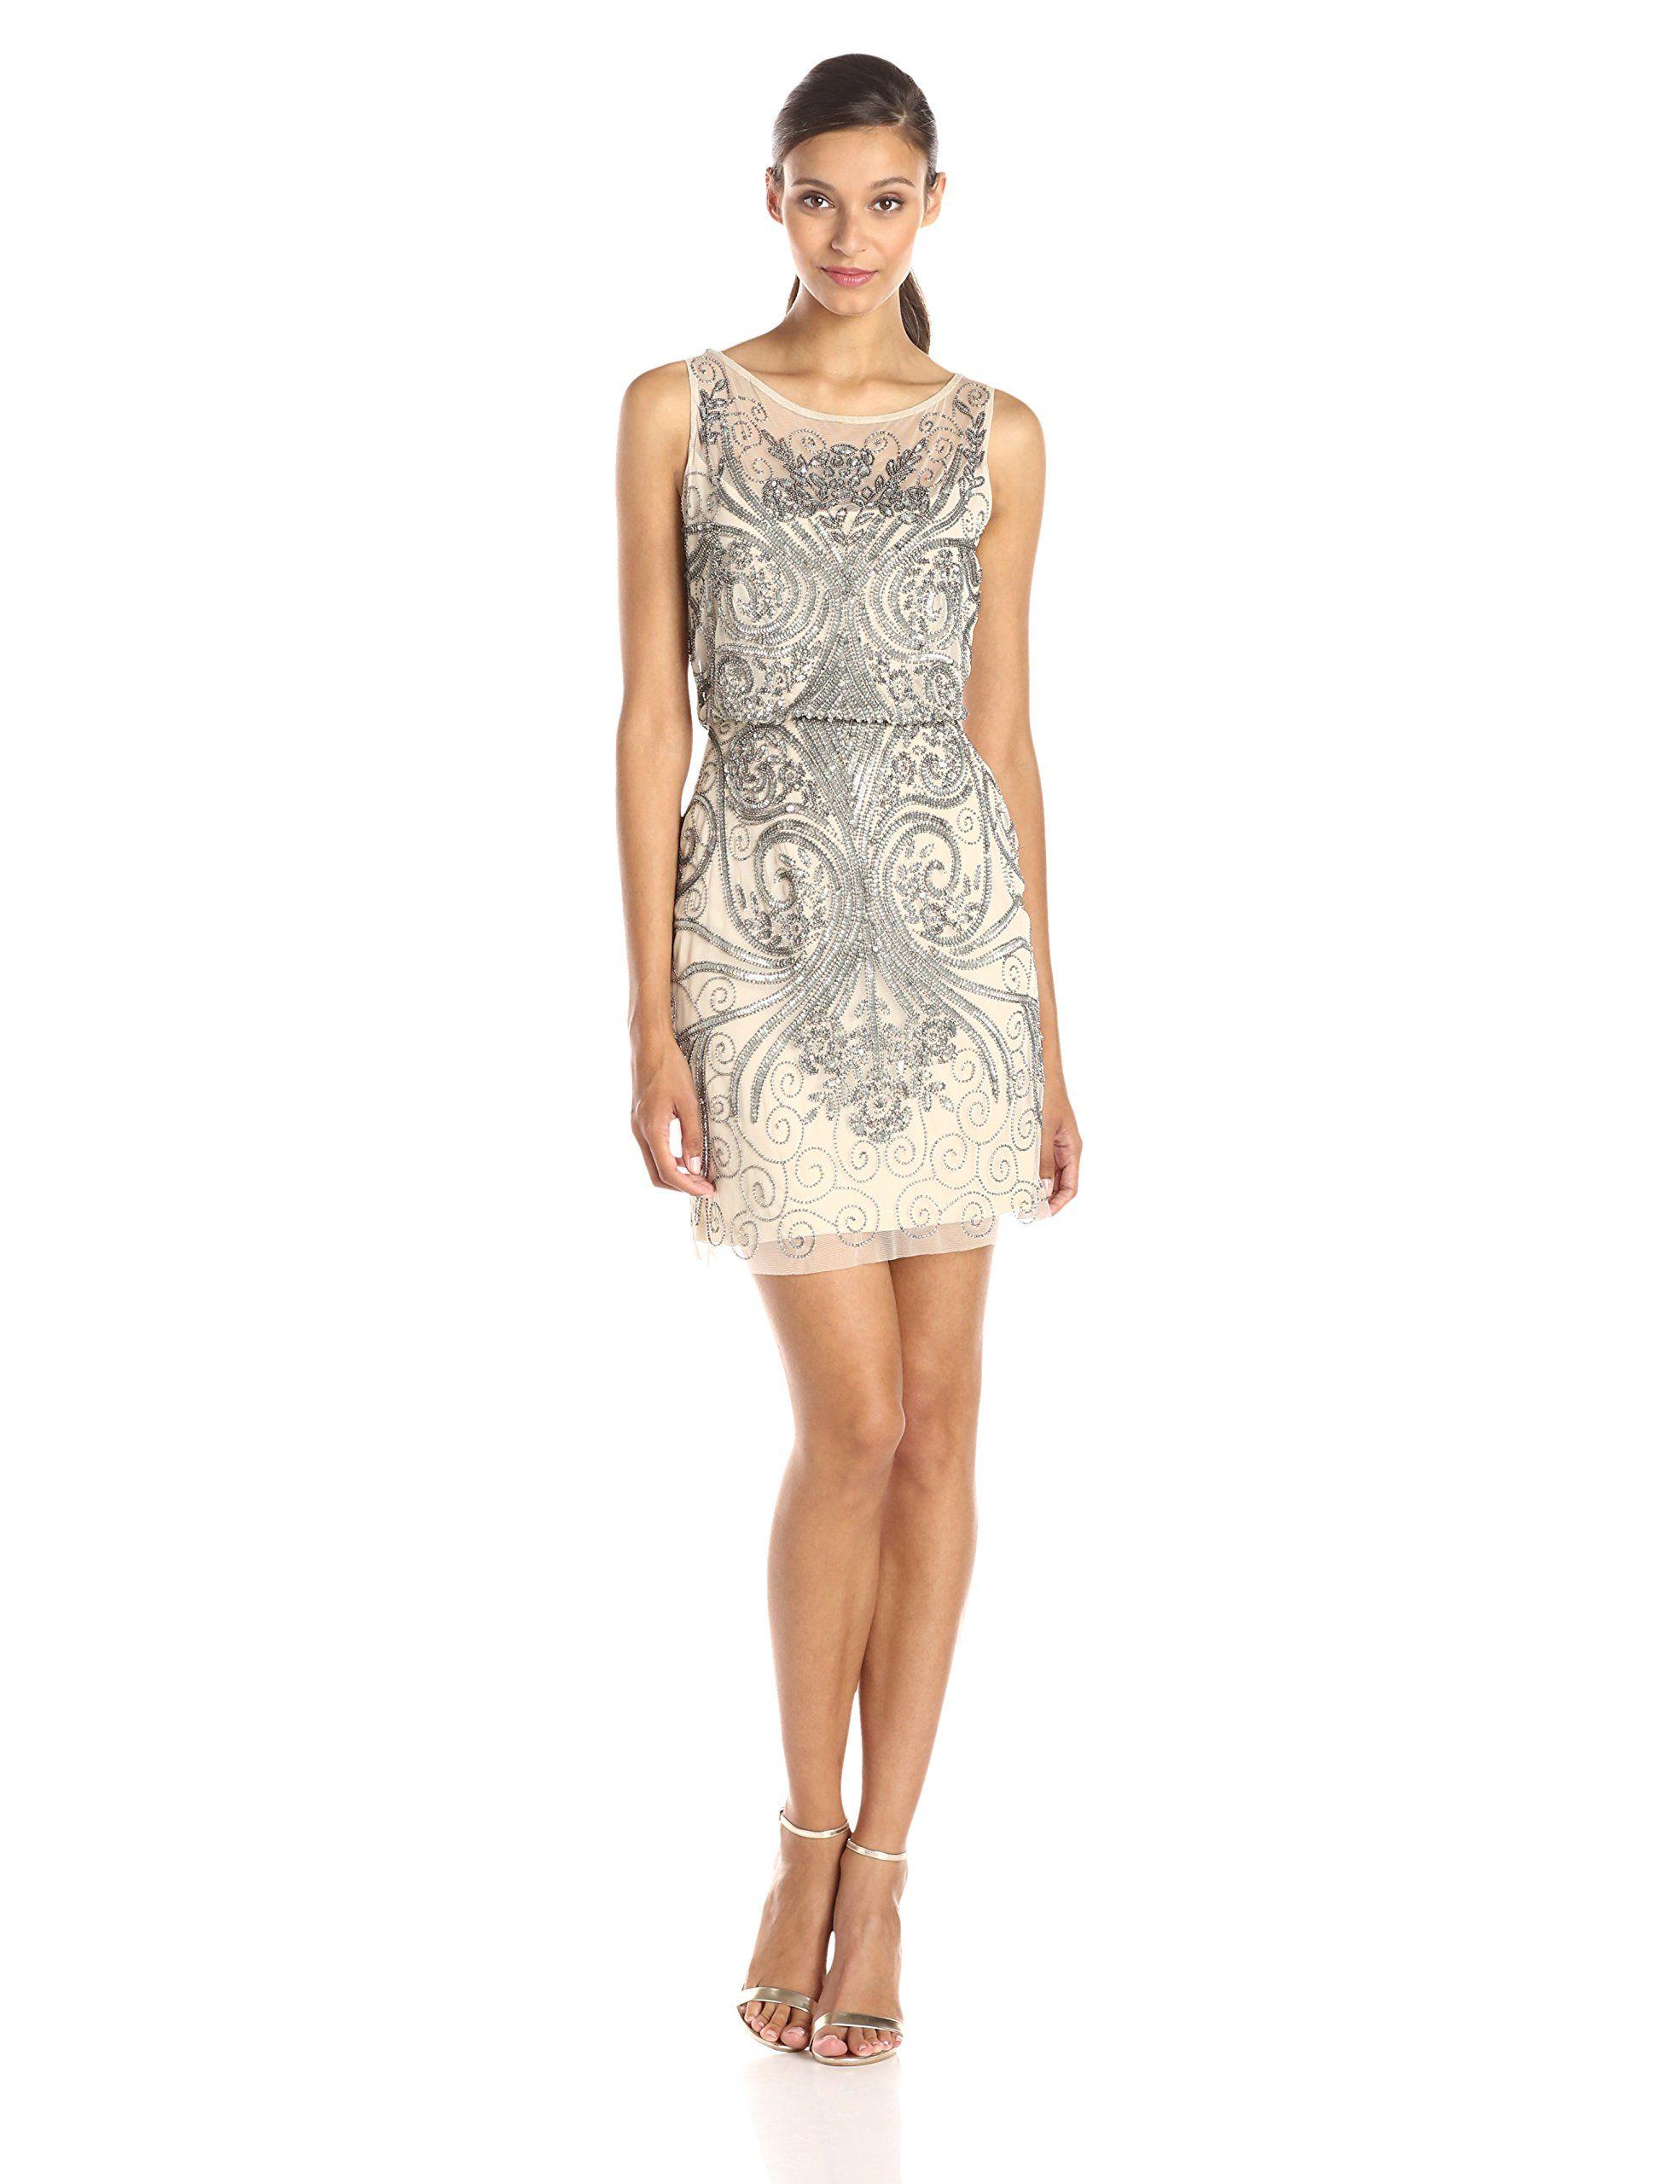 Adrianna Papell Women\'s Sleeveless Beaded Blouson Cocktail Dress ...